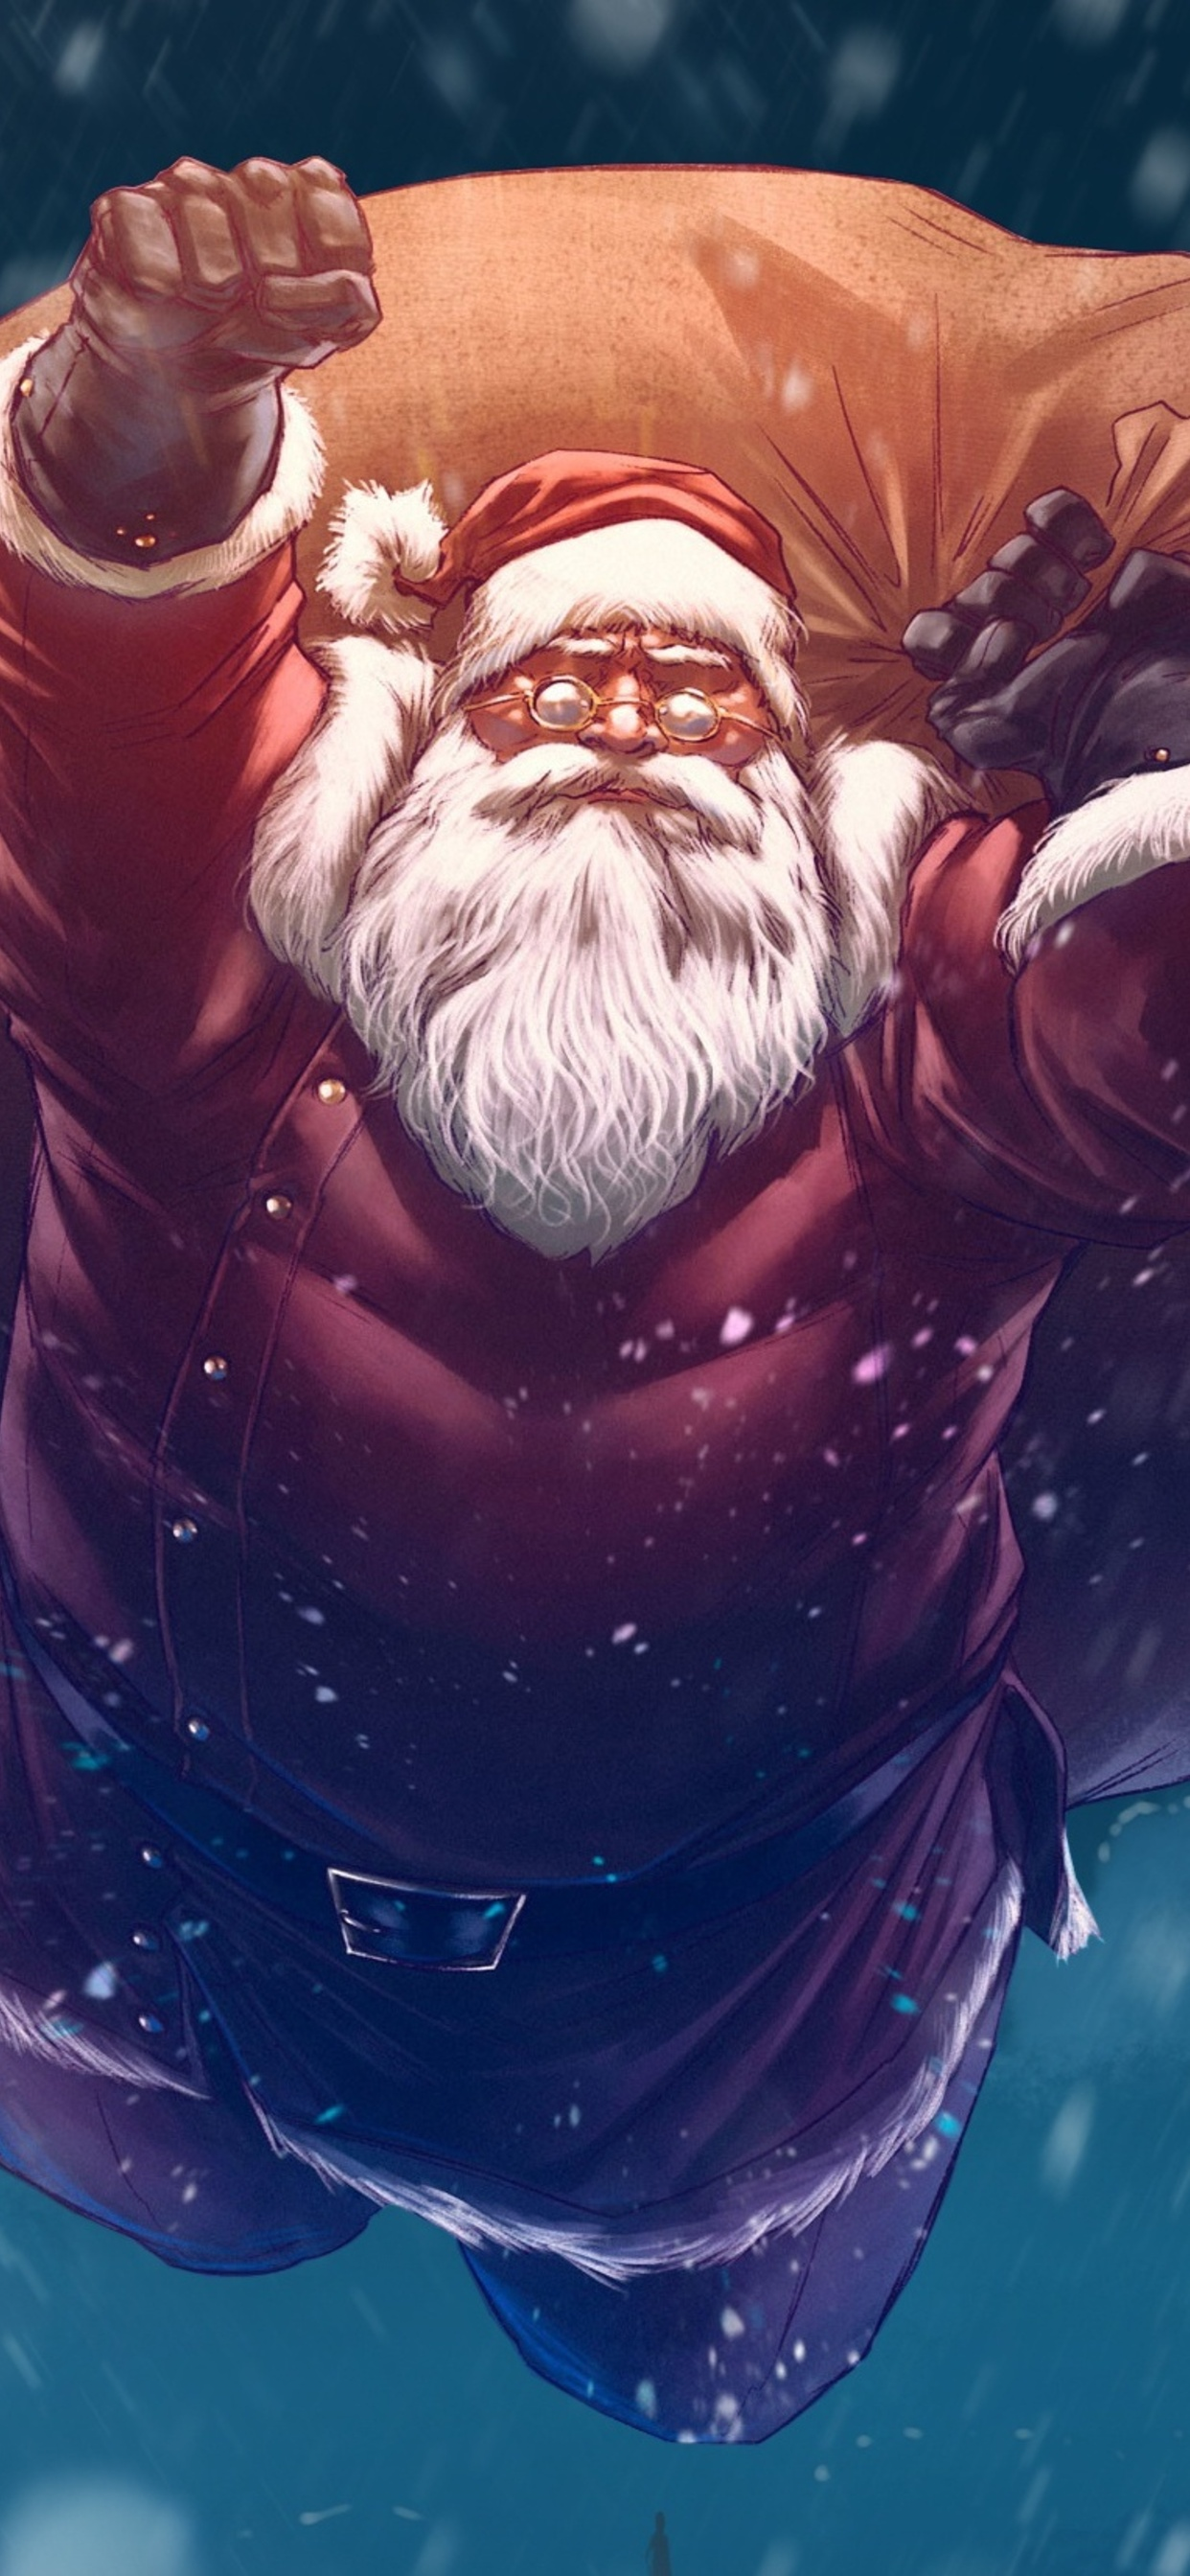 christmas-santa-digital-art-2e.jpg